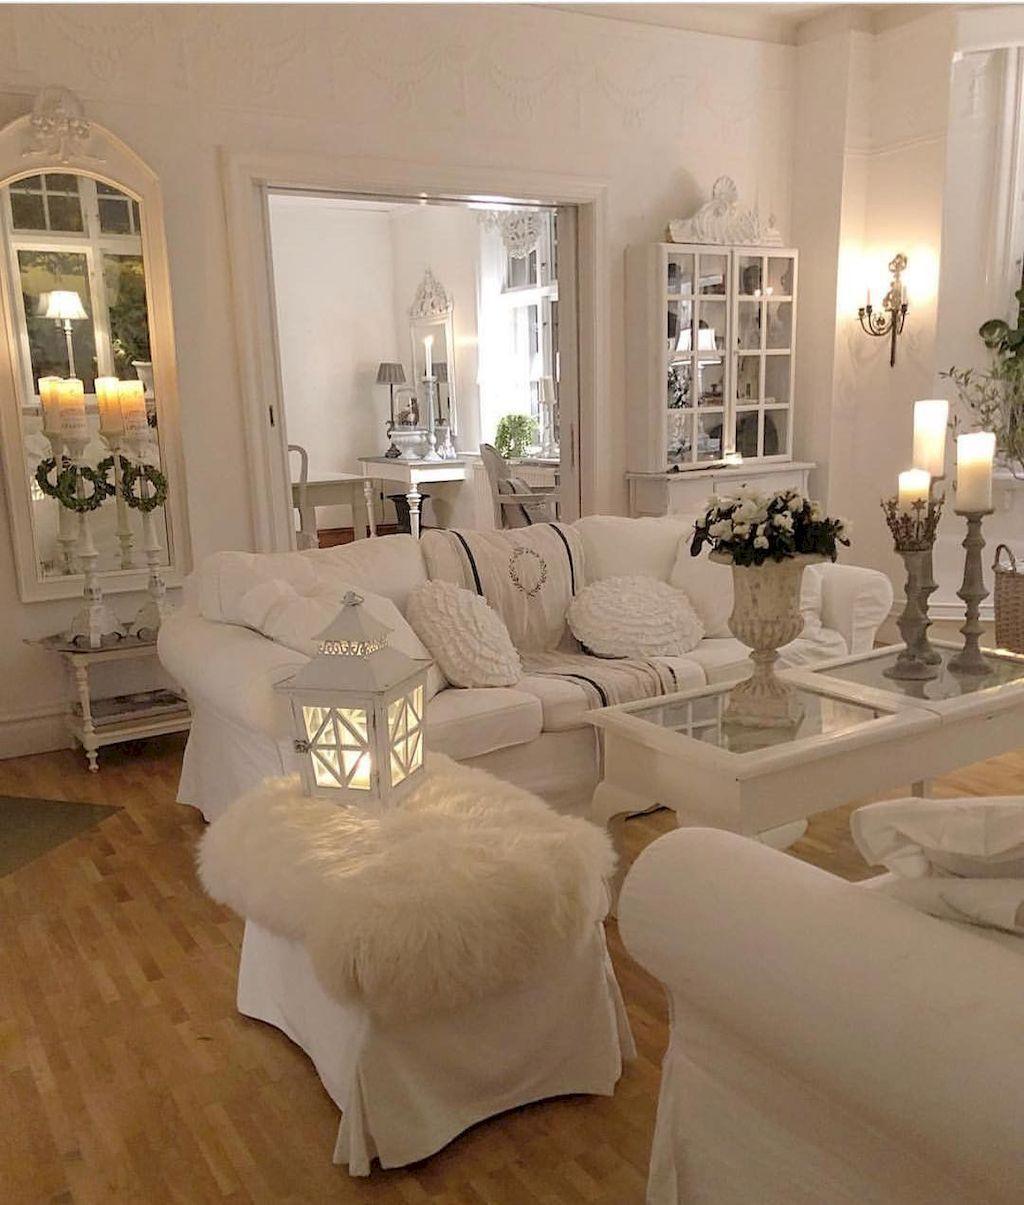 16 Romantic Shabby Chic Living Room Decor Ideas - #16 #chic #Decor